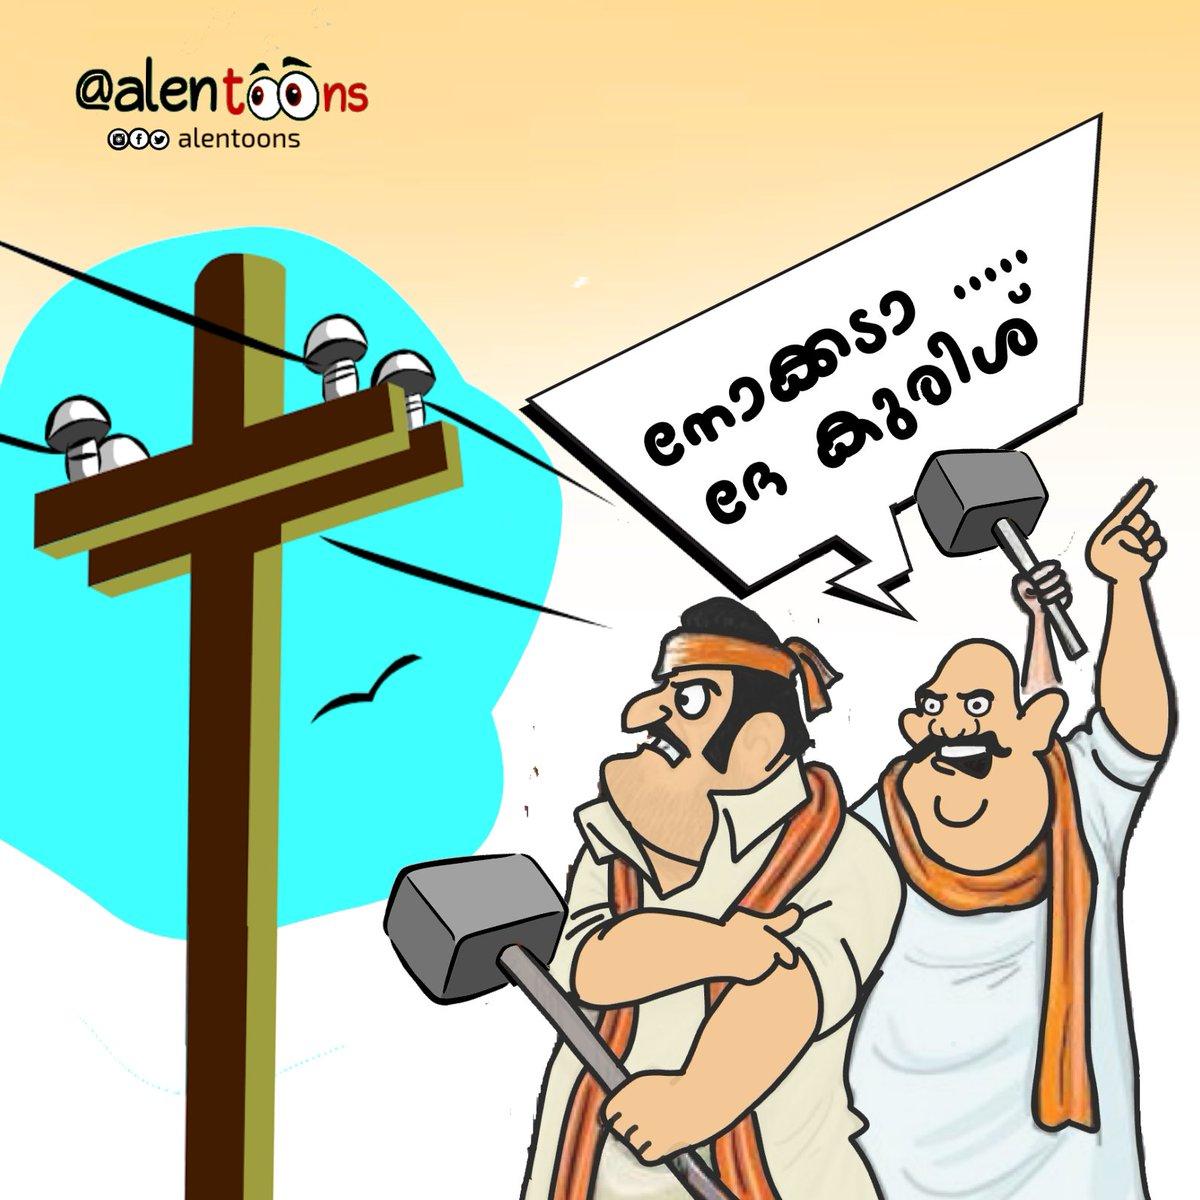 Hhനോക്കി നിക്കാതെ അങ്ങ് പൊളിക്ക് ഷാജിയേട്ടാ ..Jai BajragDal . . Reference:Cartoonist SatishAcharya  #religion #minnalmurali #Malayalamcinema#tovino#rss #hindu #malayalamcartoon#muslim  #malayalamfilm#terrorism #illustration  #malayalam#movie#film #currentaffair#dailydrawingpic.twitter.com/BnOl356o6I